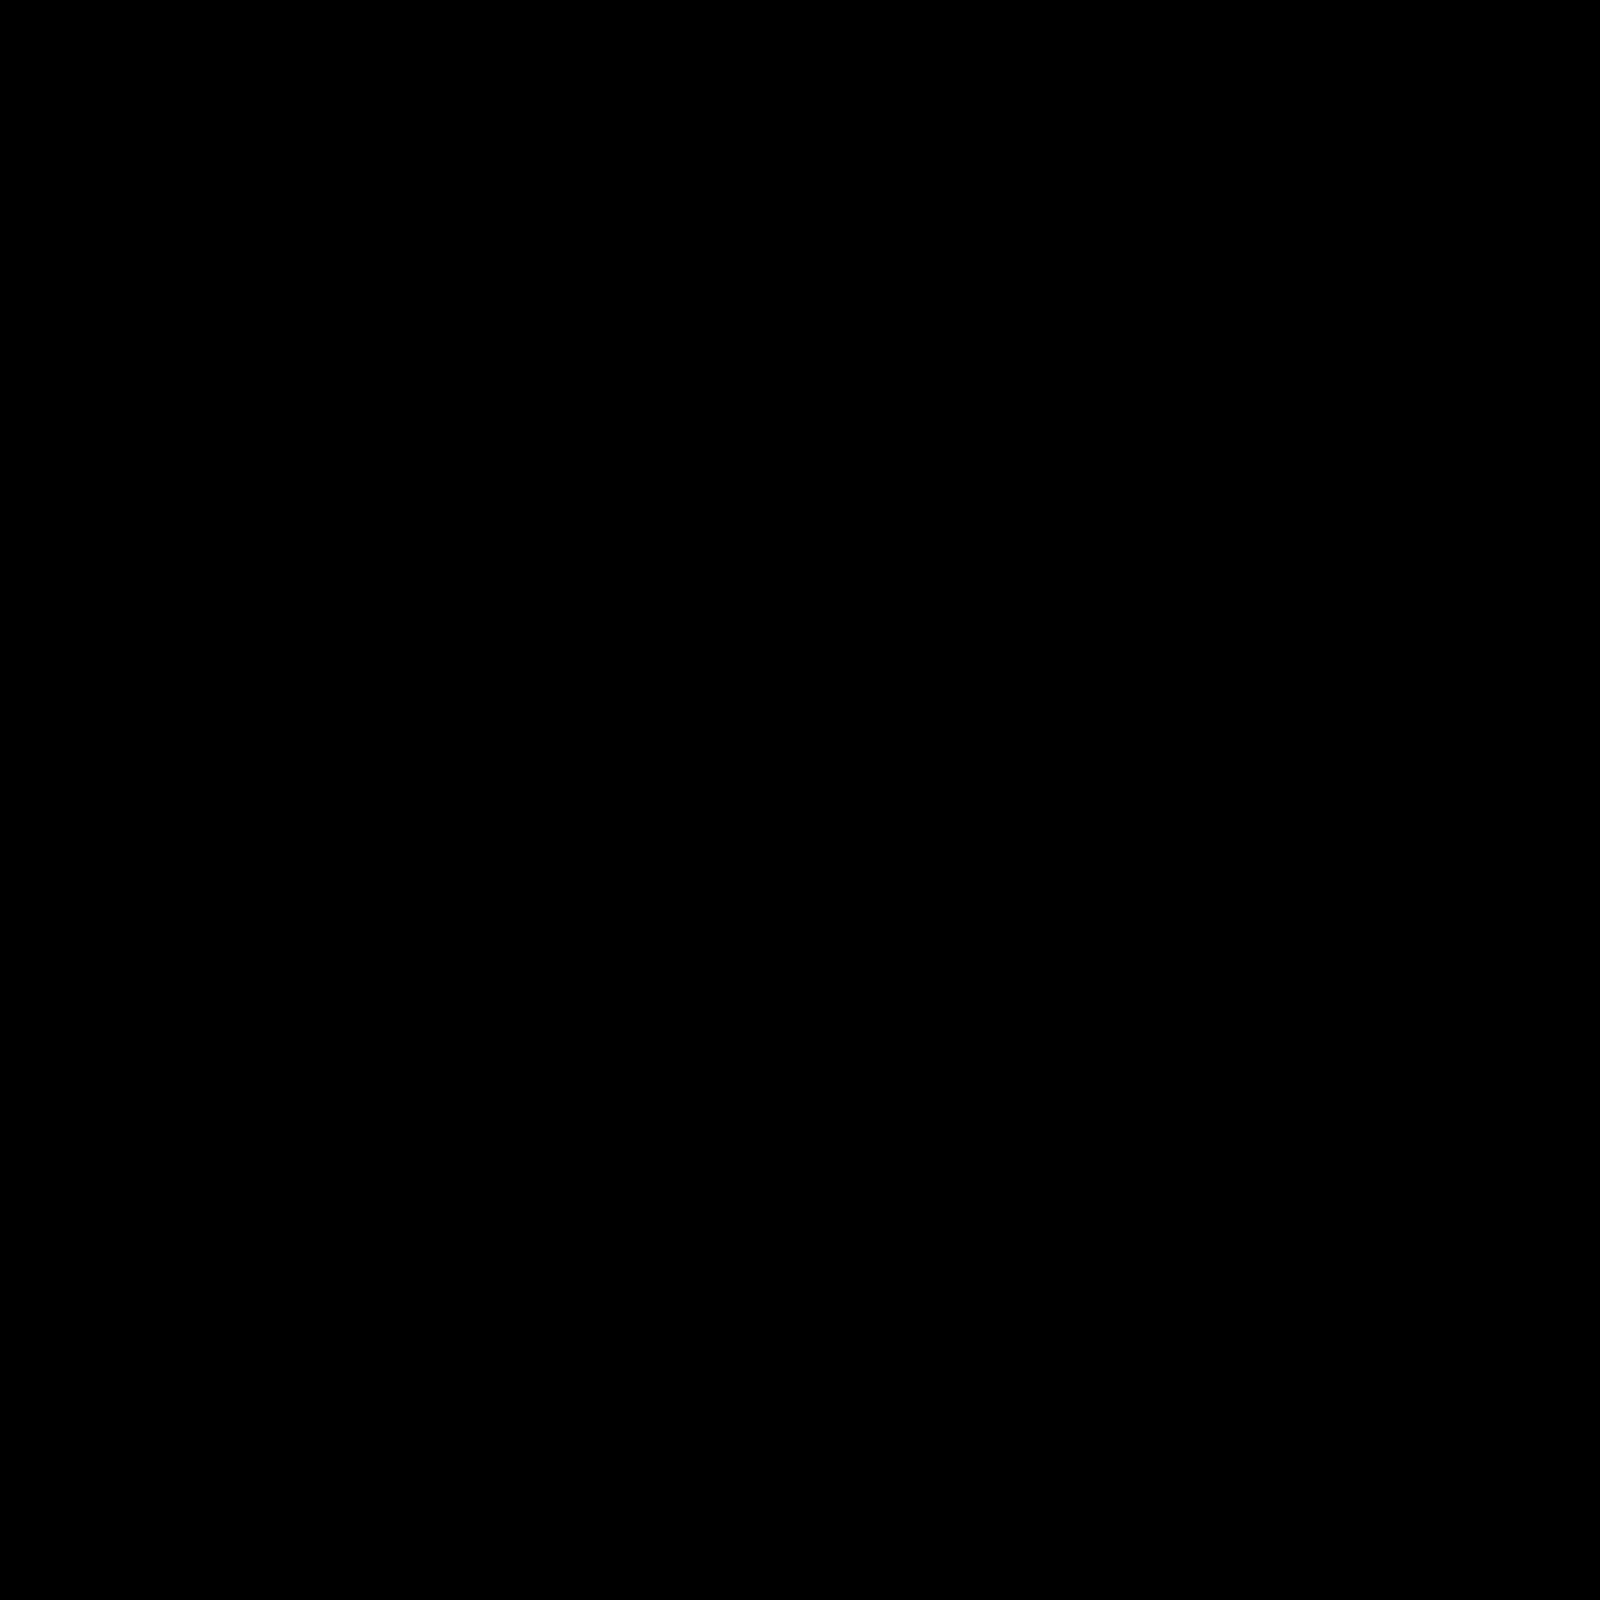 Wstęp icon